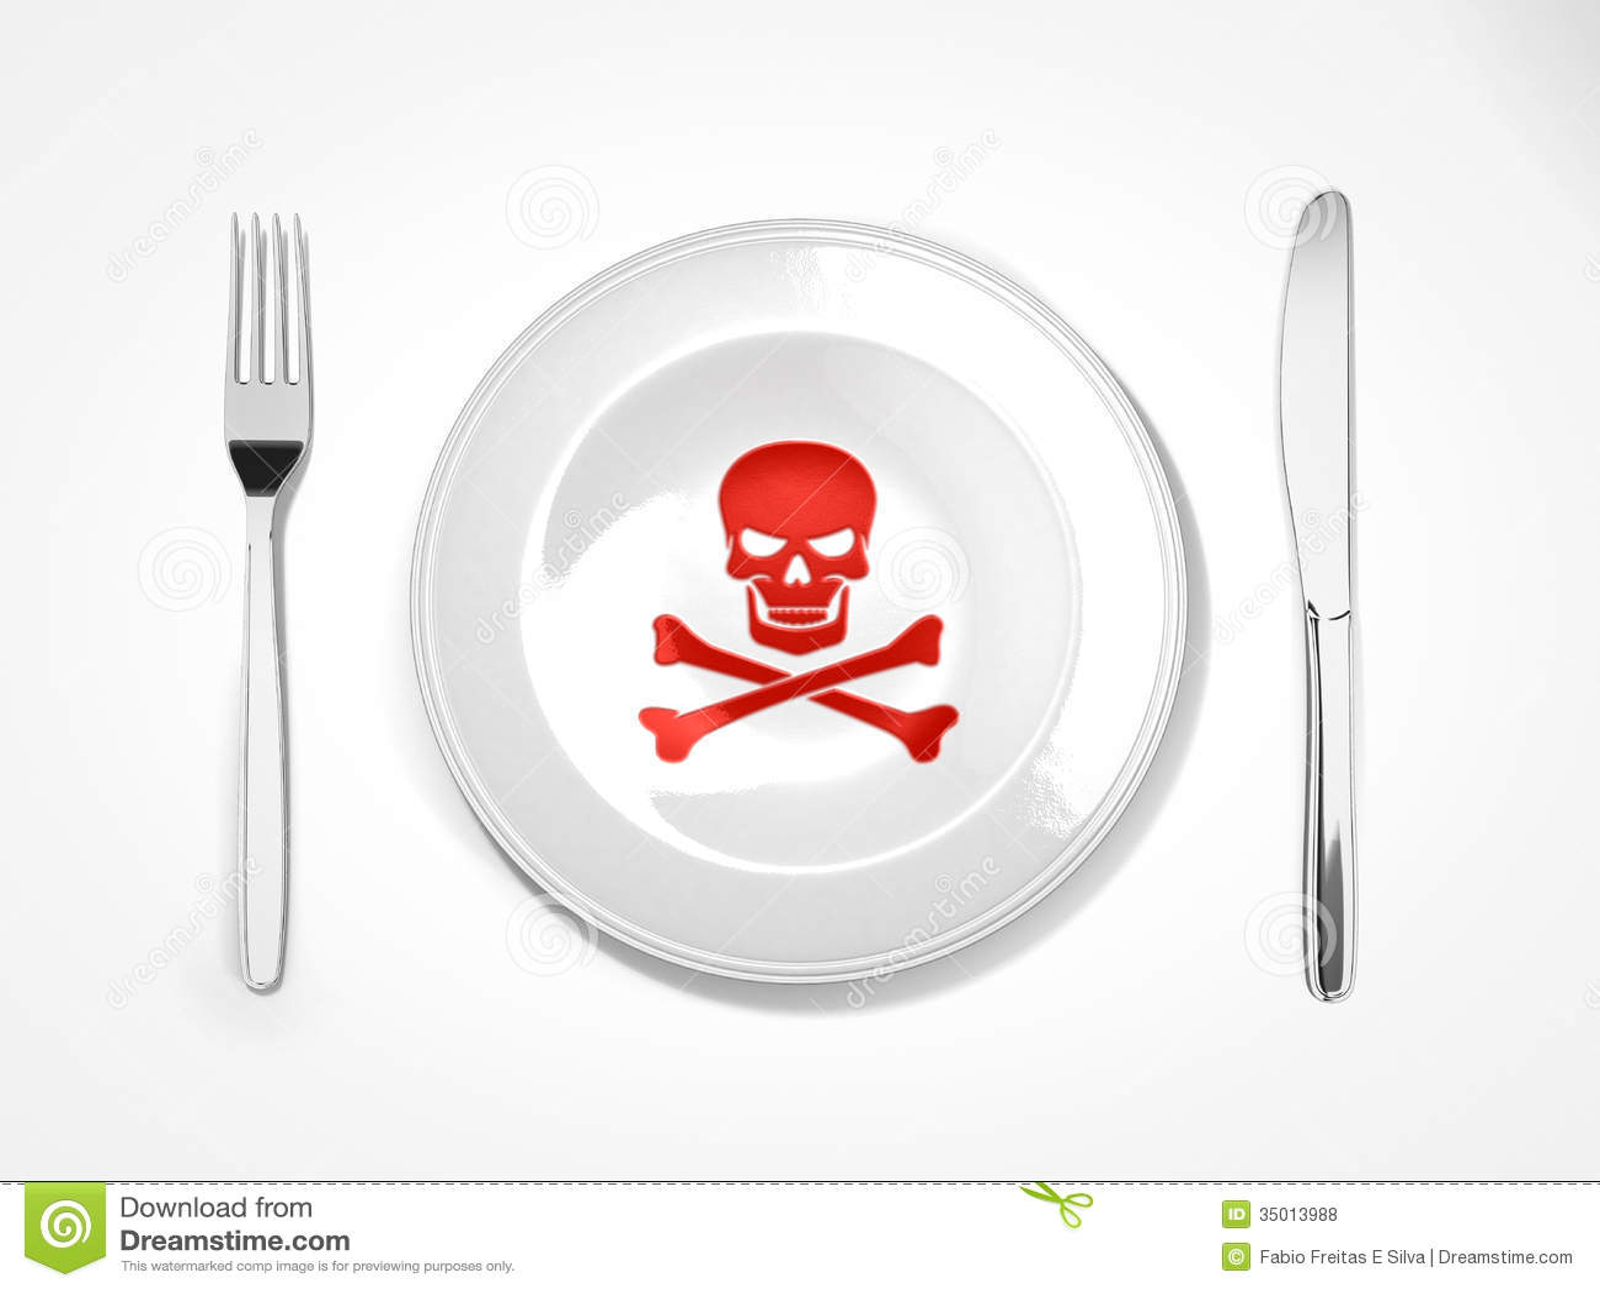 Food Dangerous Royalty Free Stock Photos Image 35013988